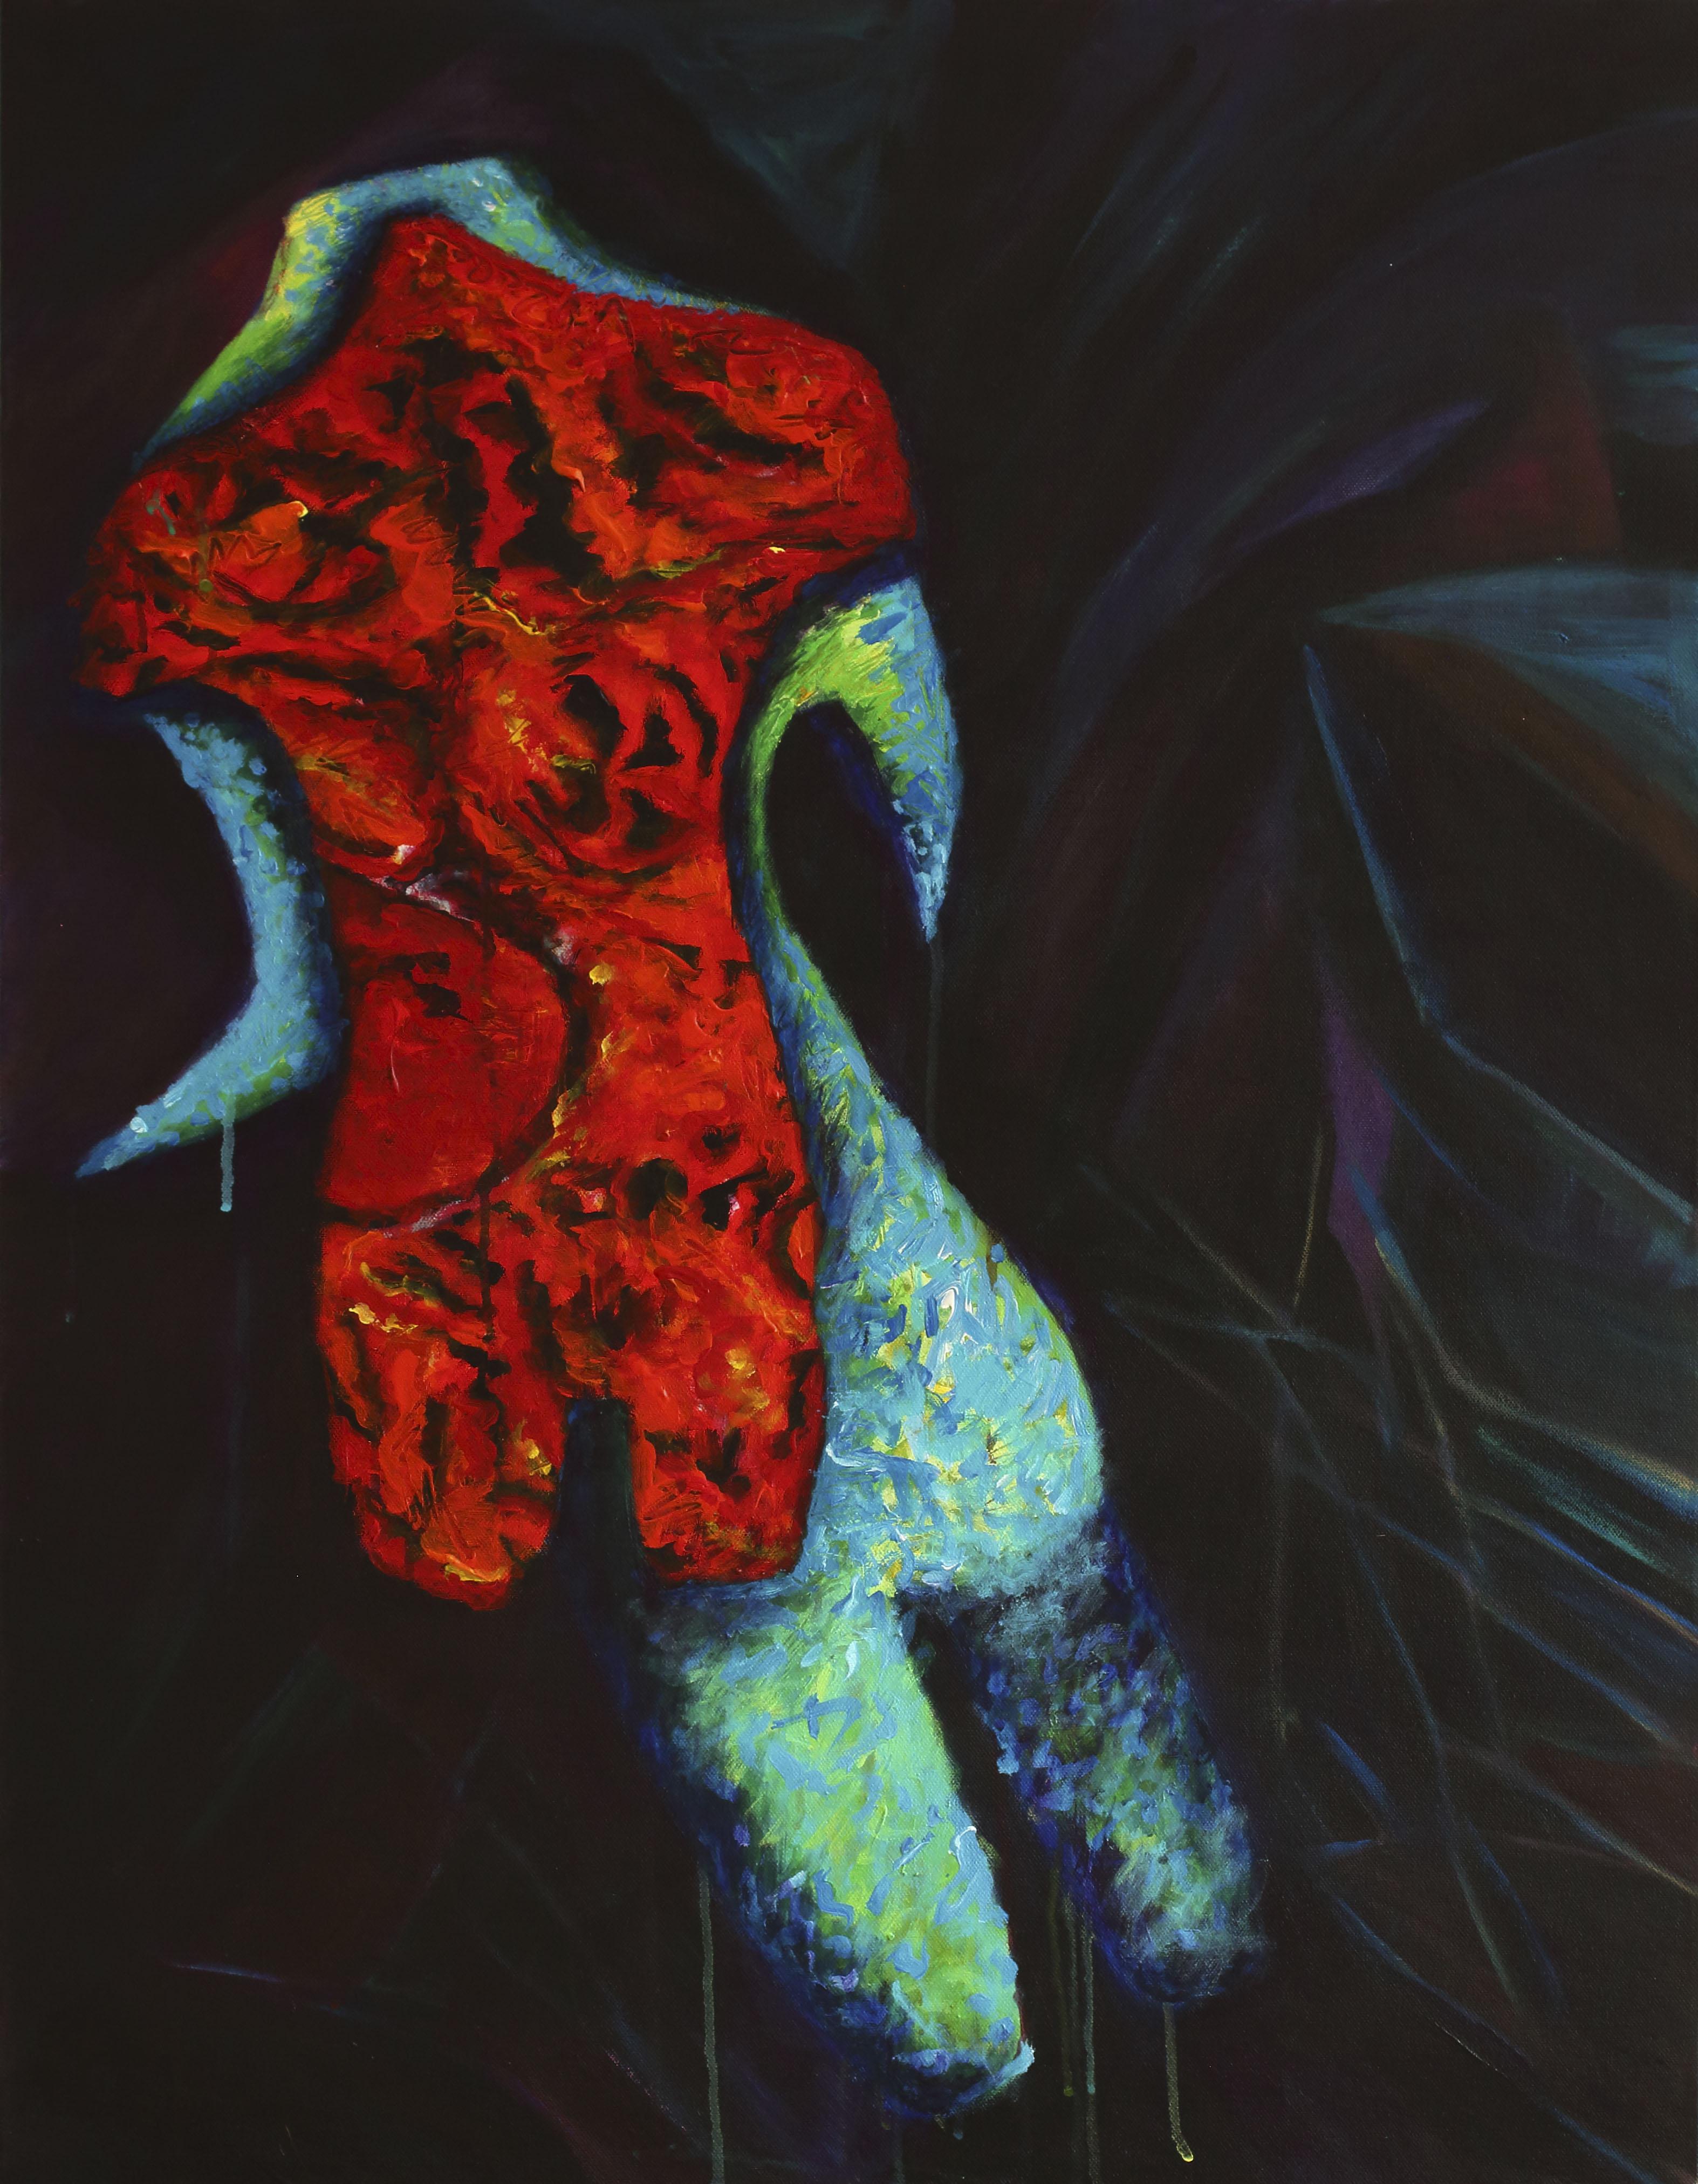 Nocturne - 70 x 90 cm - acryl op doek